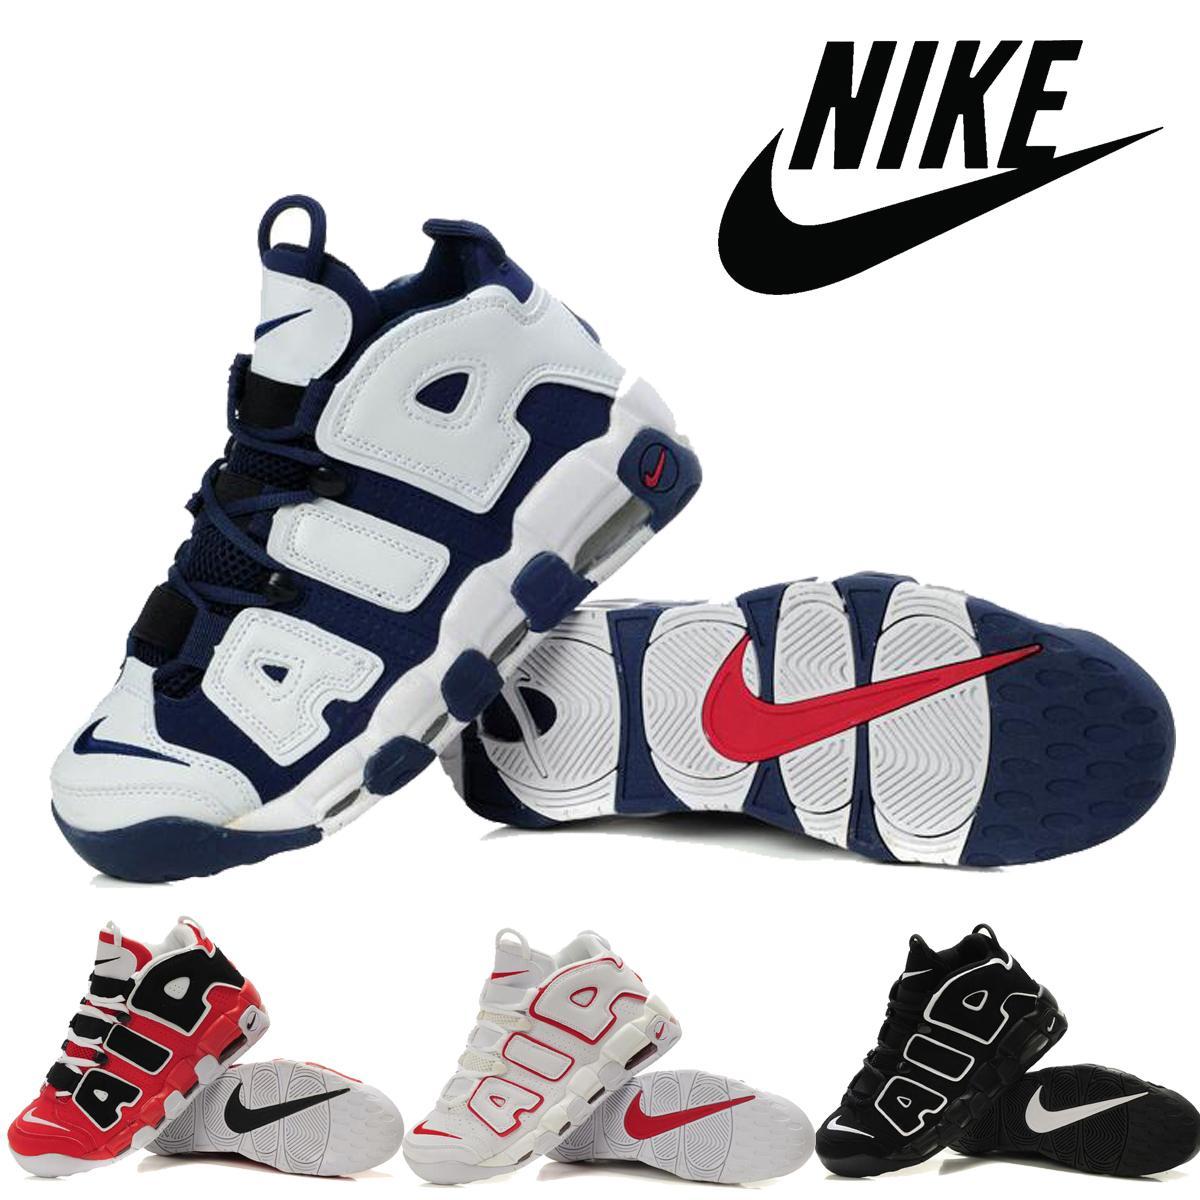 Basket Nike Chaussures Plus Uptempo De Pippen Acheter Hommes Air mOyN8n0vw